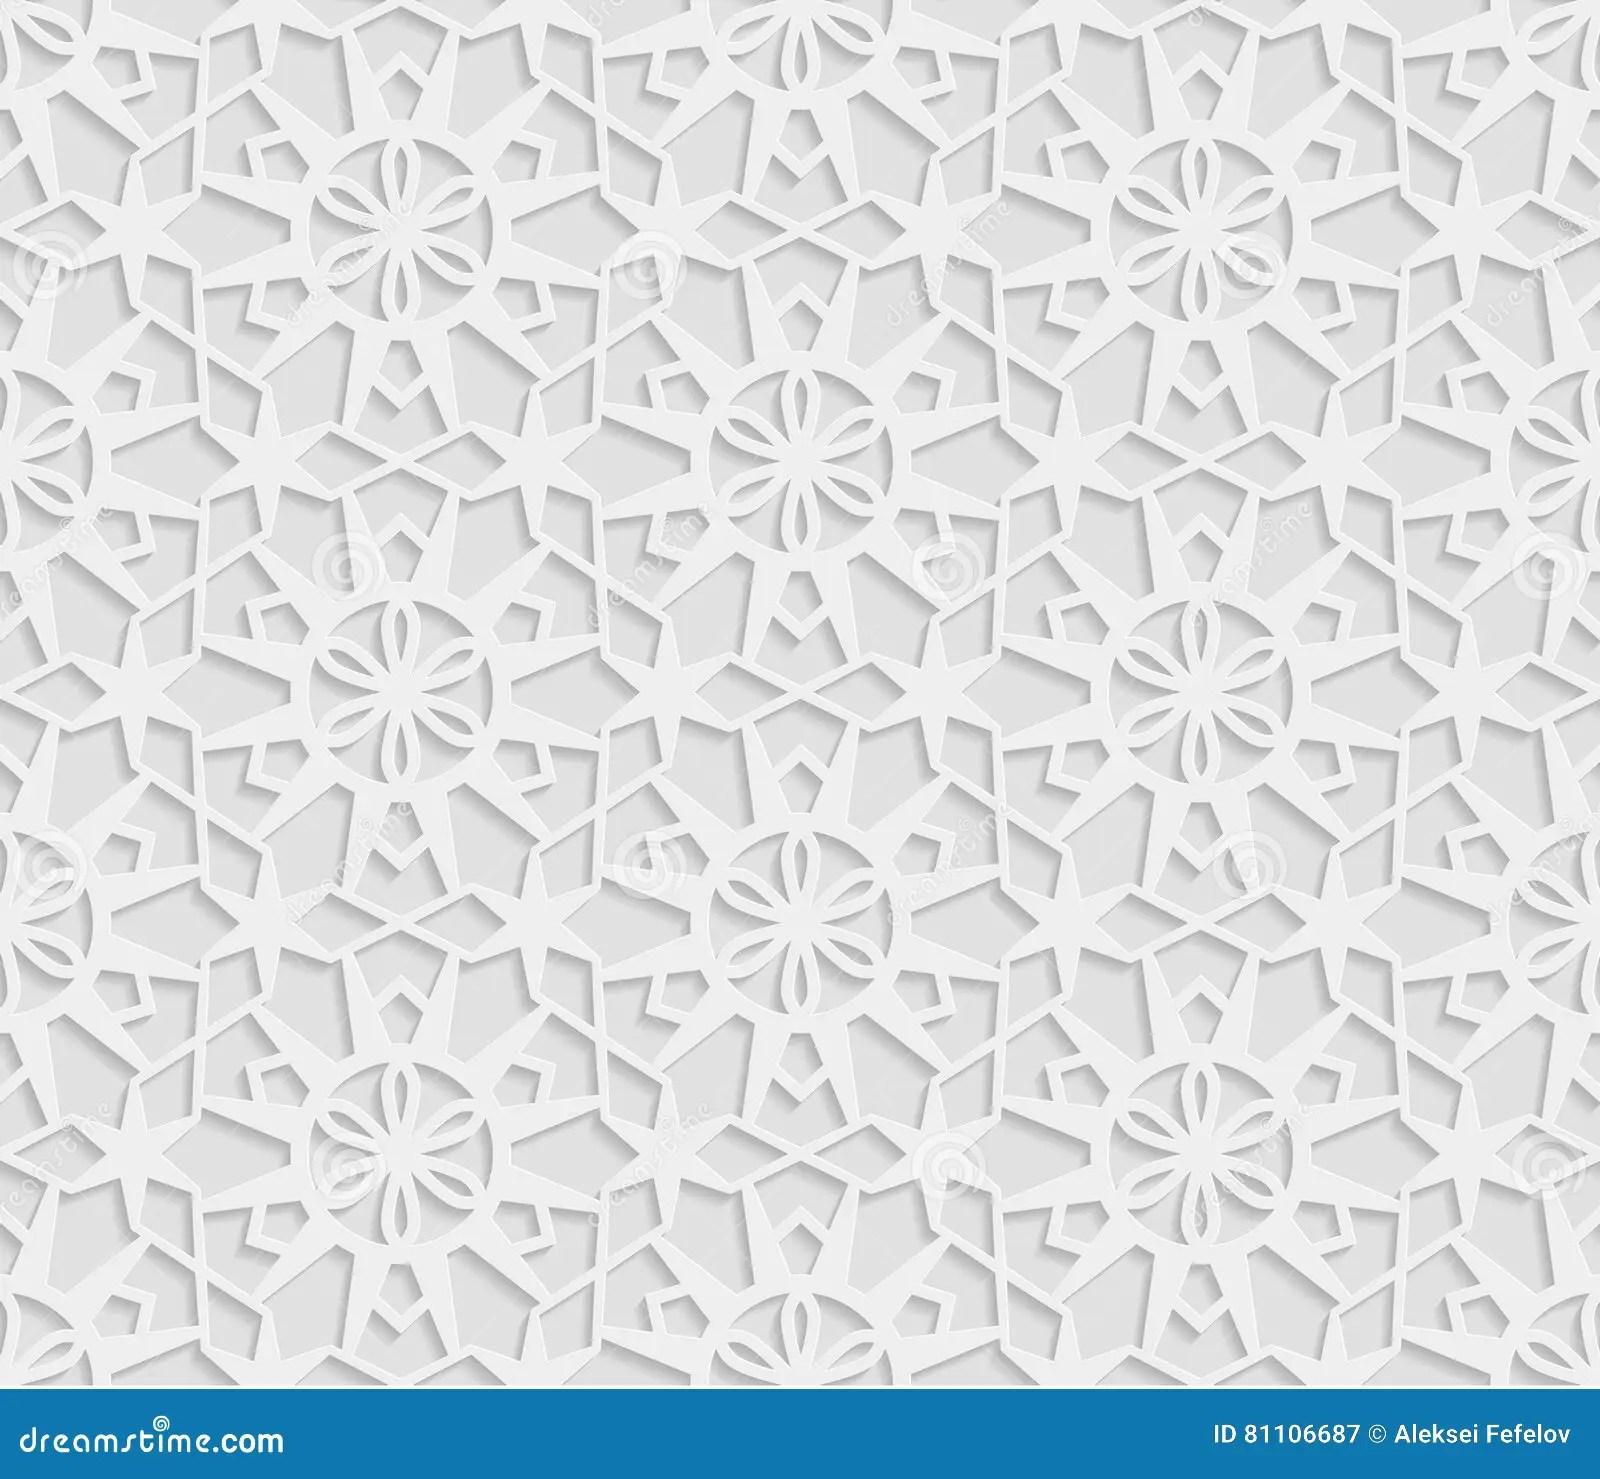 Seamless Arabic Geometric Pattern, 3D White Pattern Vector